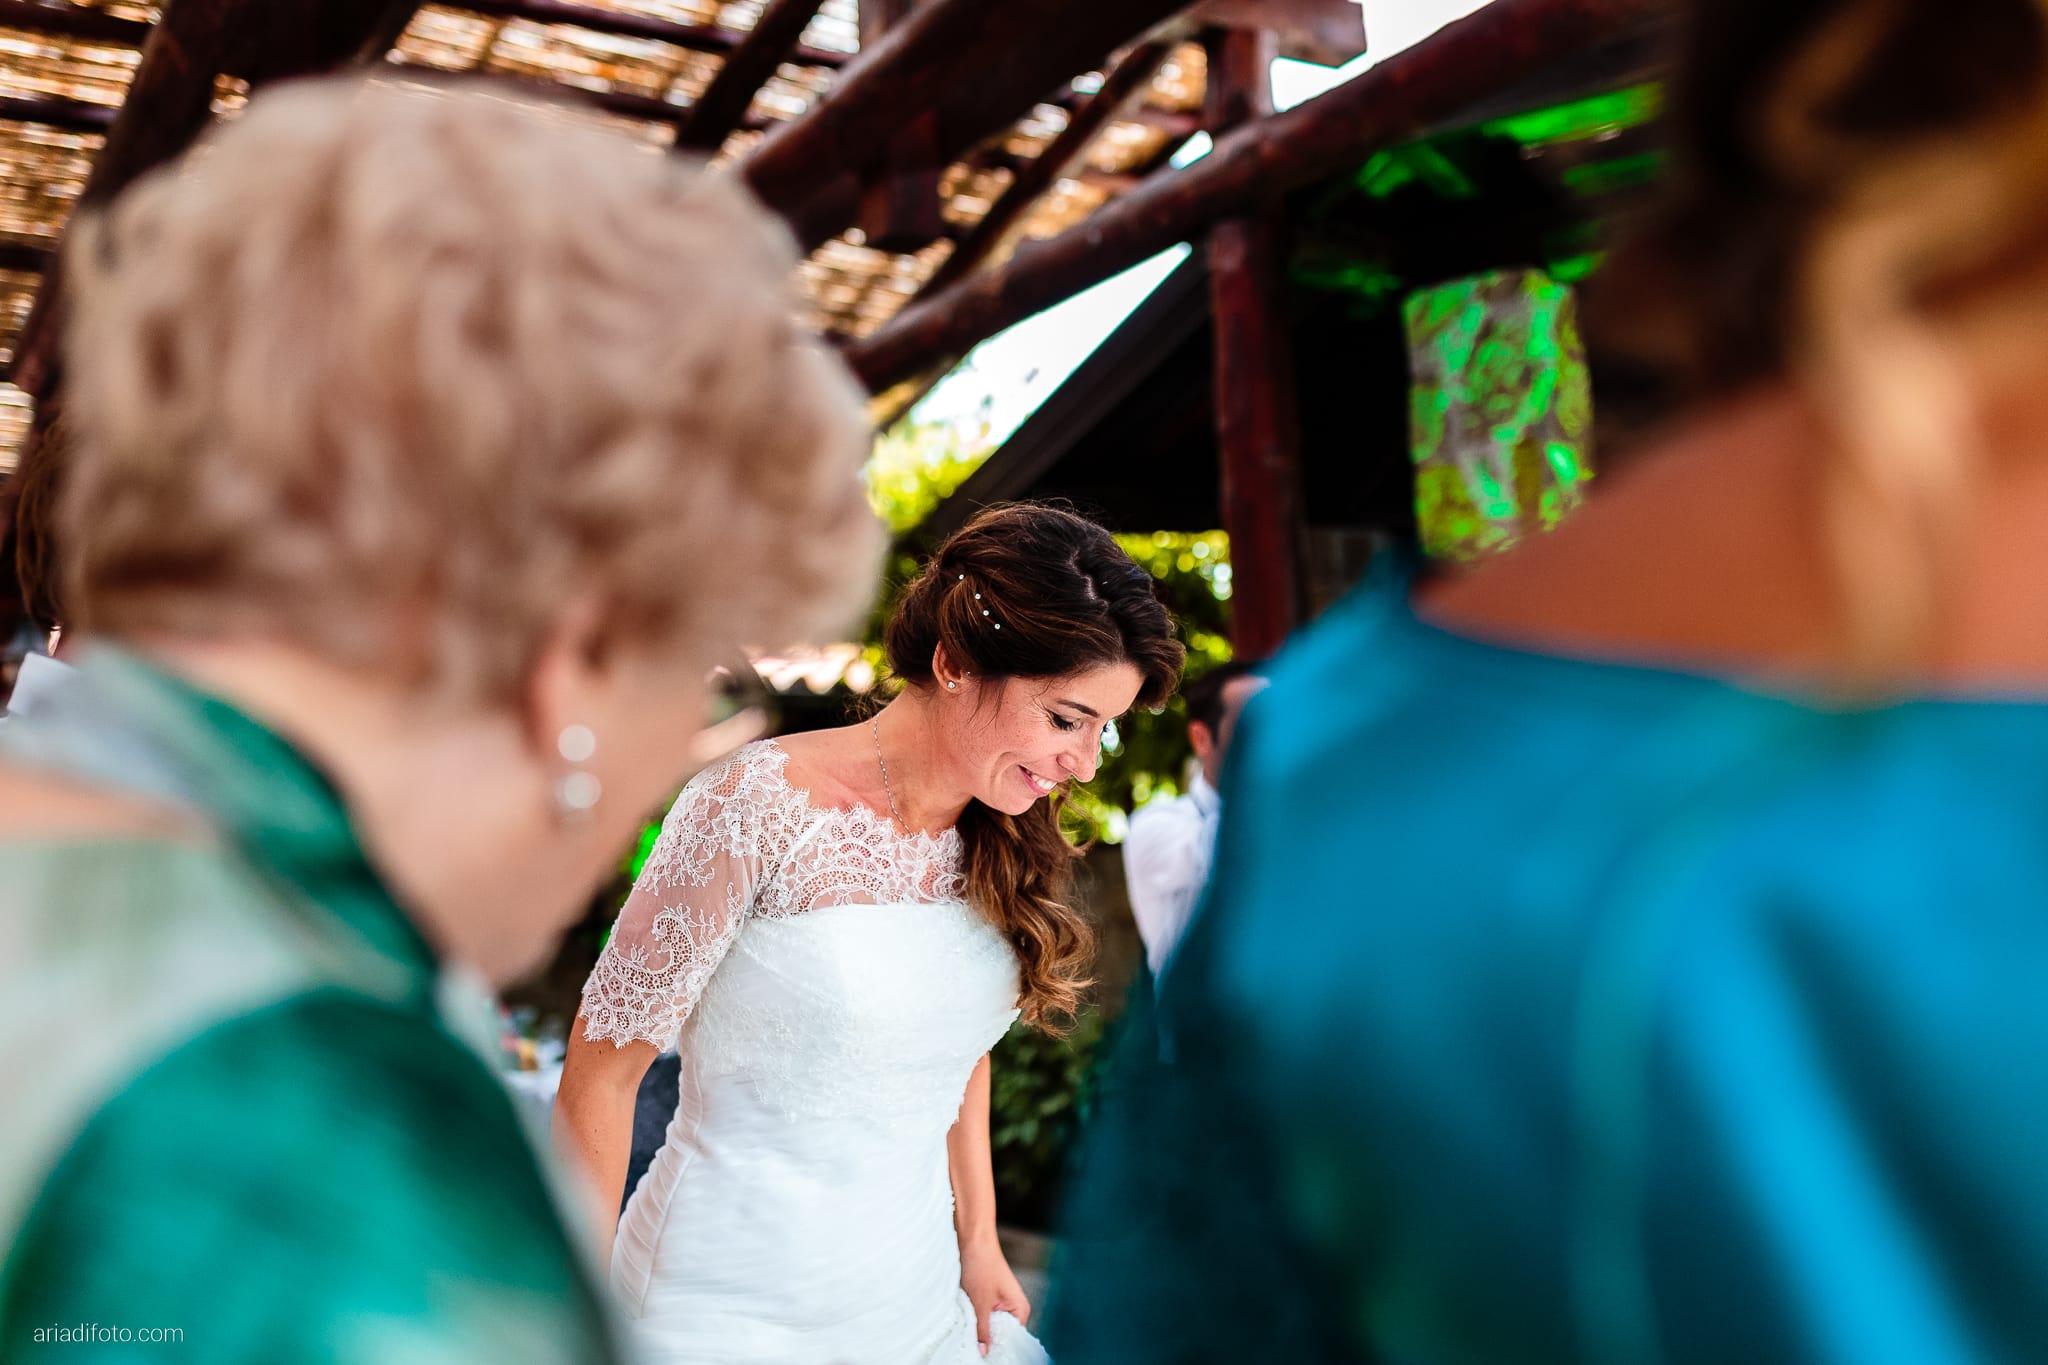 Rossella Stefano Matrimonio Muggia Mulin Koper Slovenia ricevimento festa balli